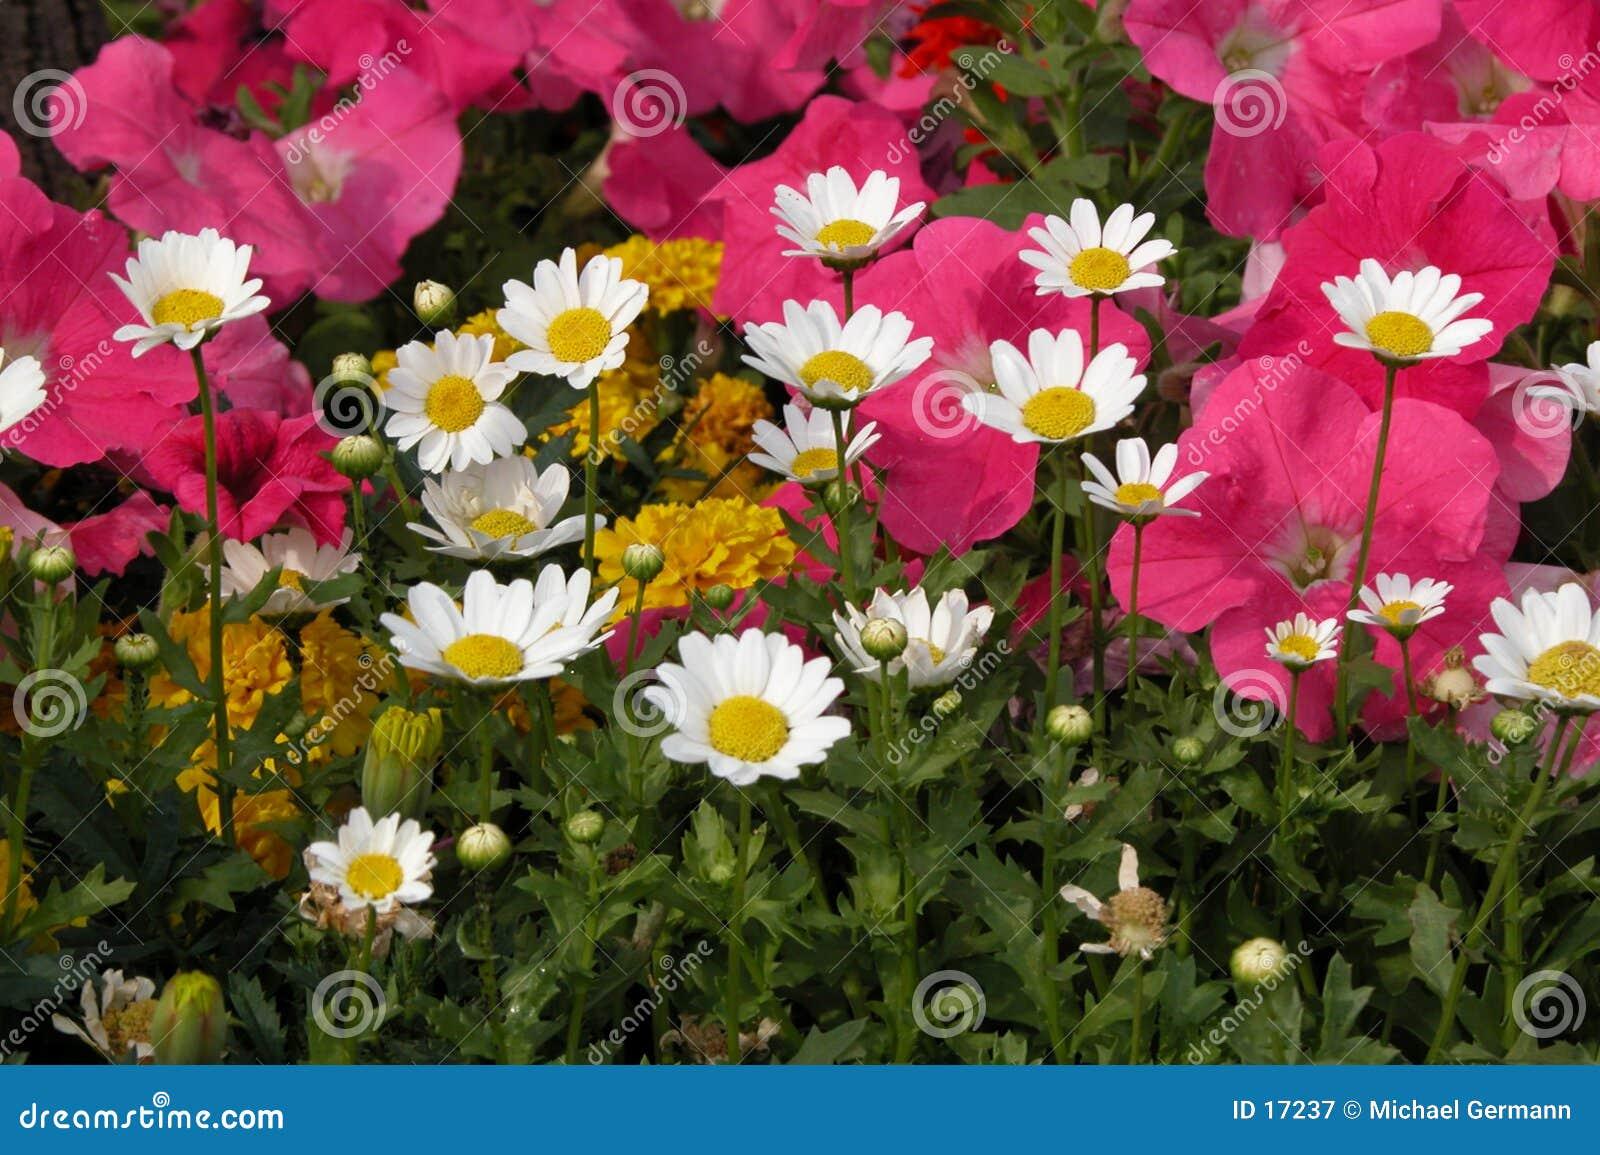 Flower Garden Stock Image. Image Of Bloom, Garden, Plant